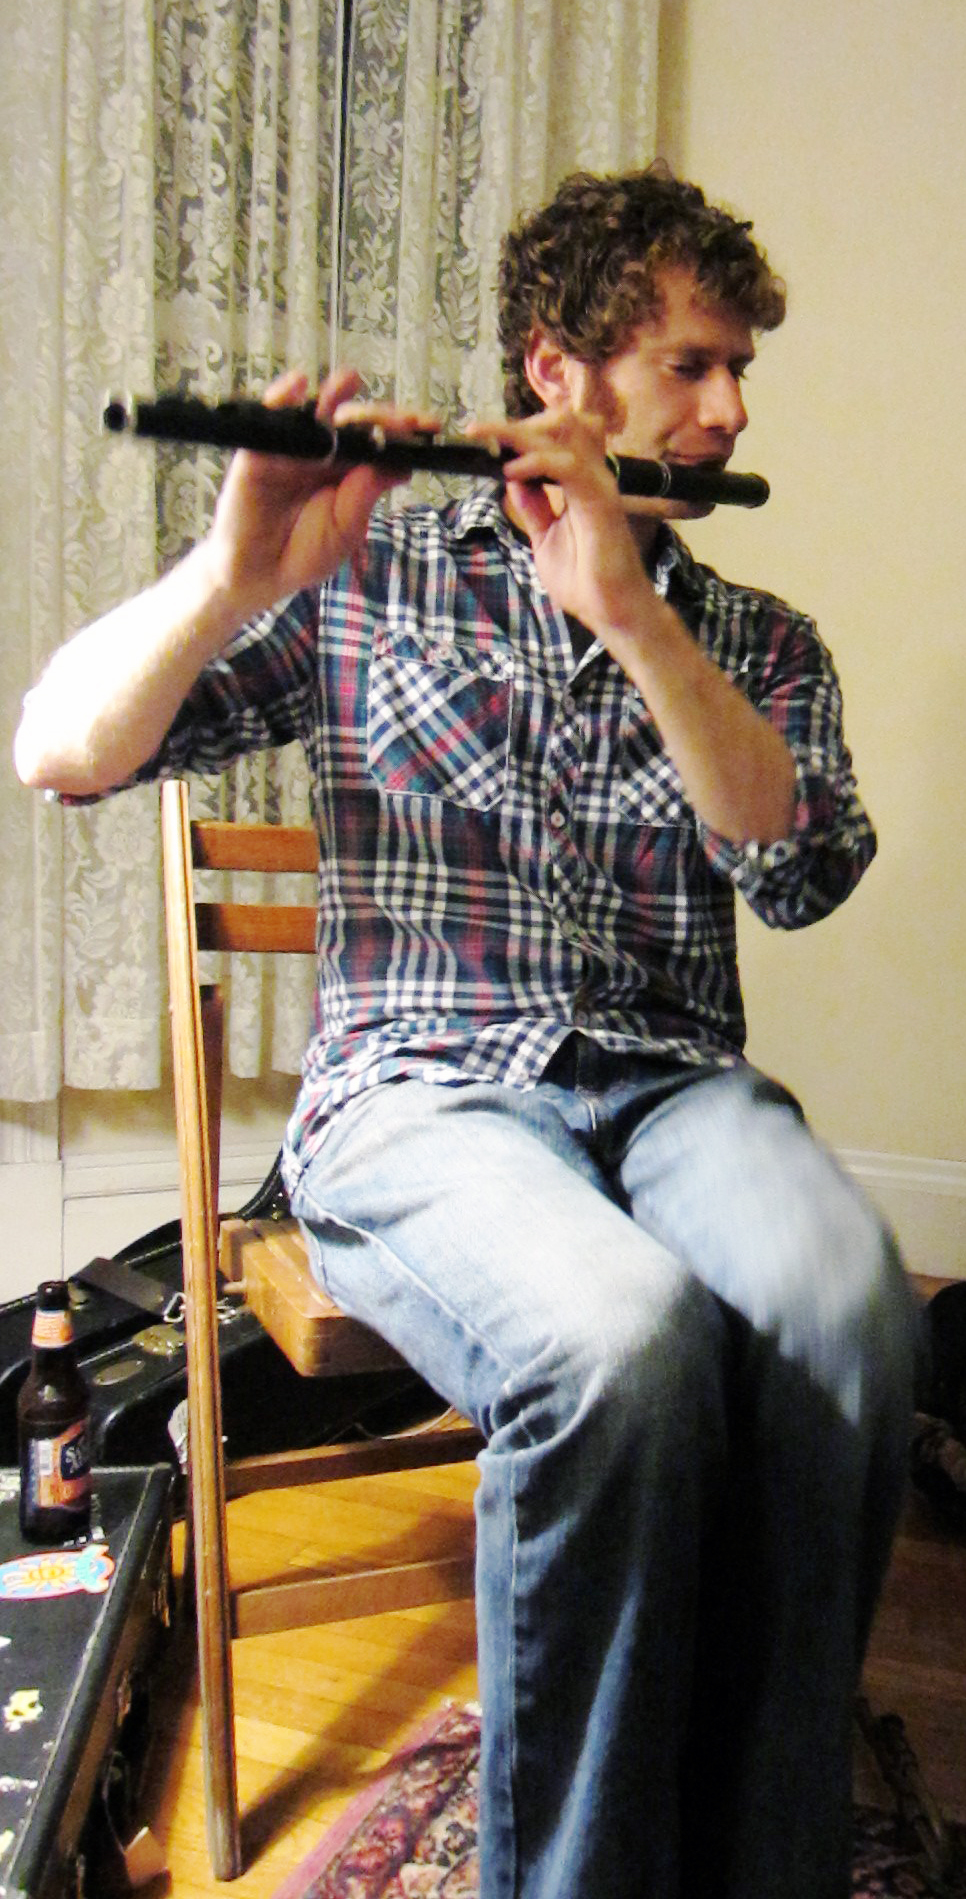 isaac flute edited.jpg